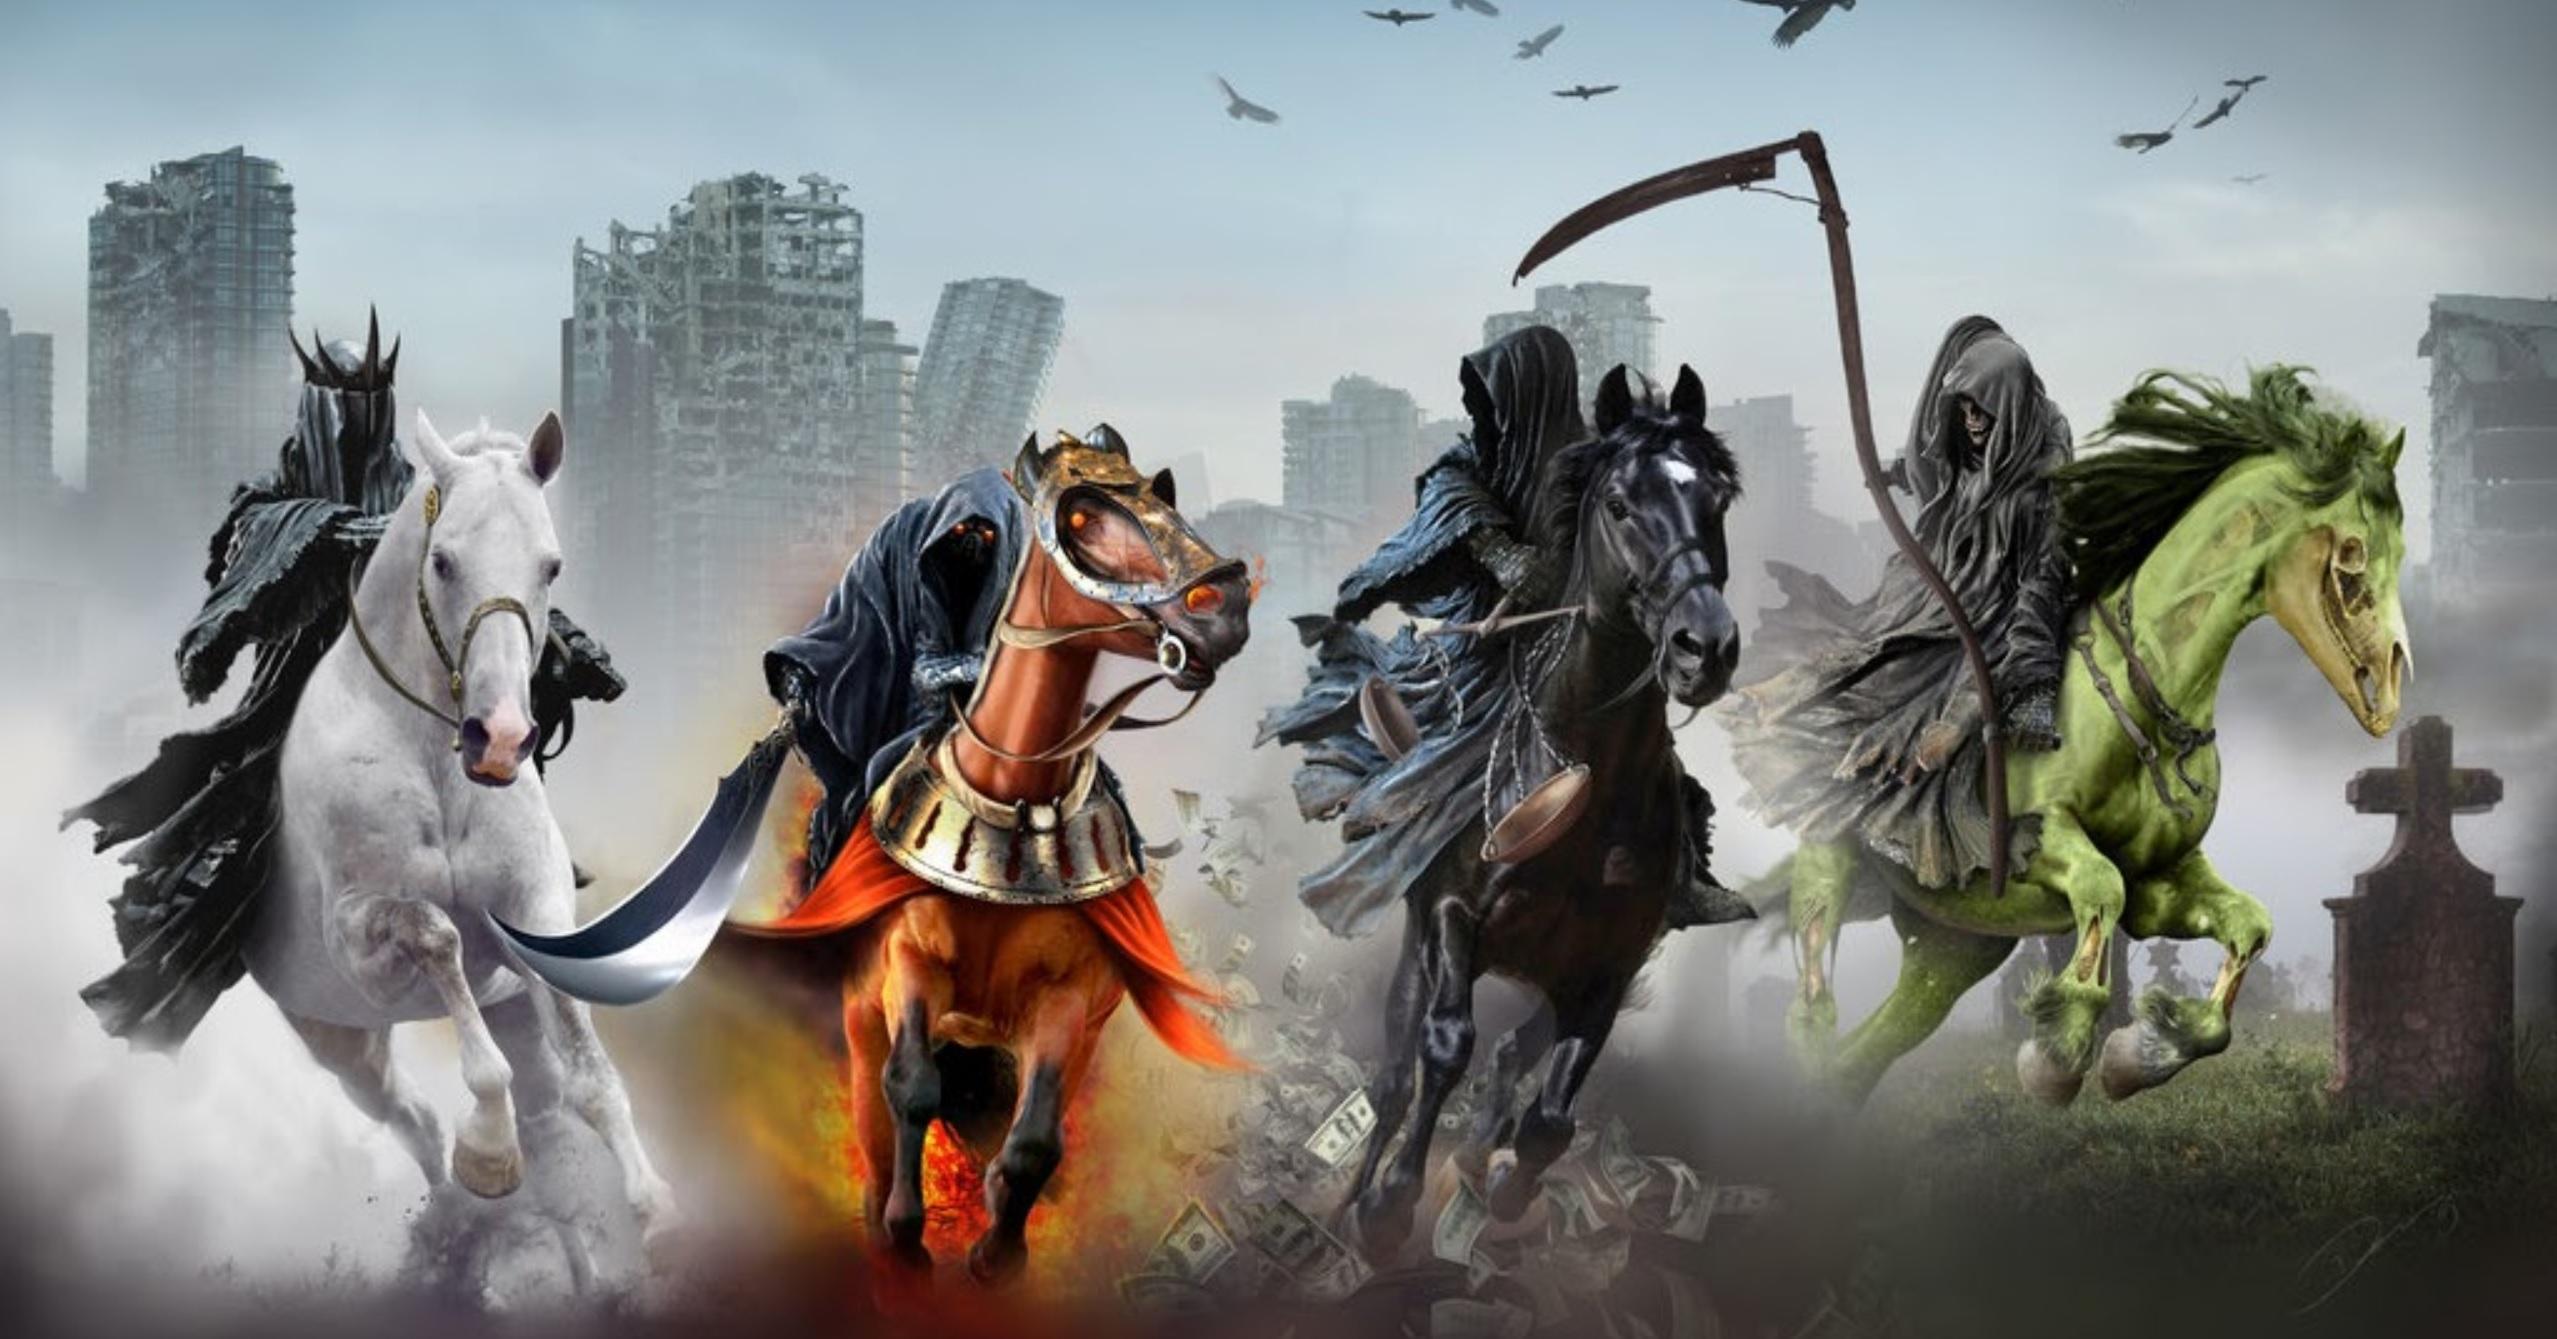 2021-10-02 Horsemen of the Apocalypse